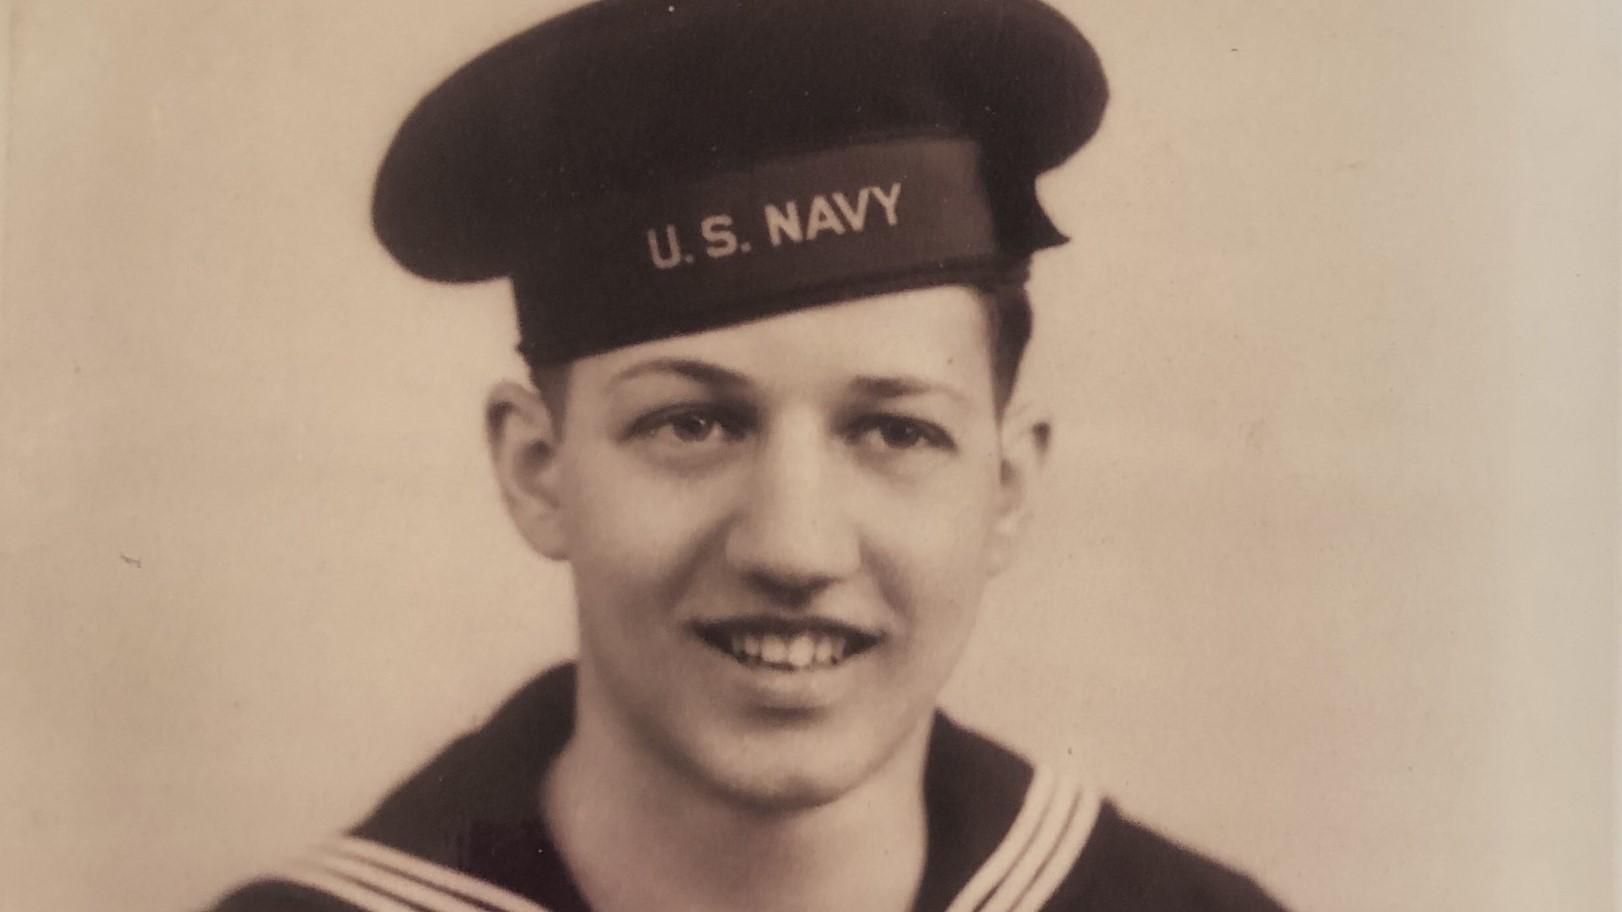 Meet Larry Sinatra: A Sailor's Story